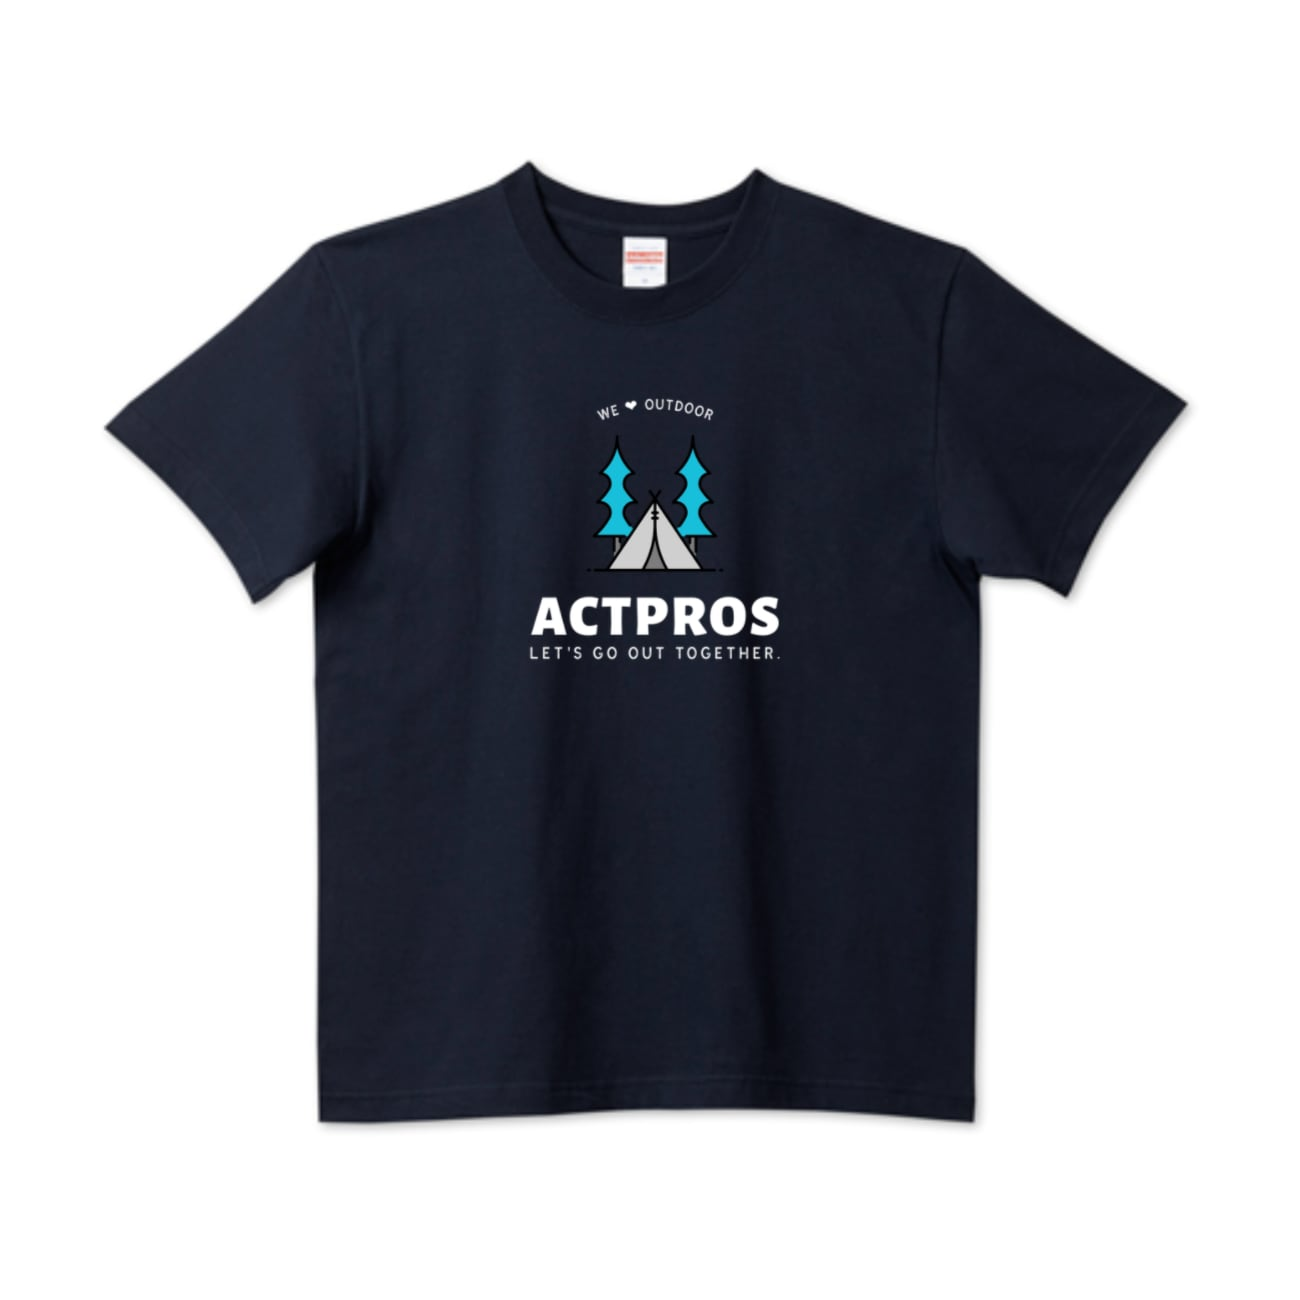 ACTPROS WE❤︎OUTDOOR 5.6ハイクオリティーTシャツ(United Athle)